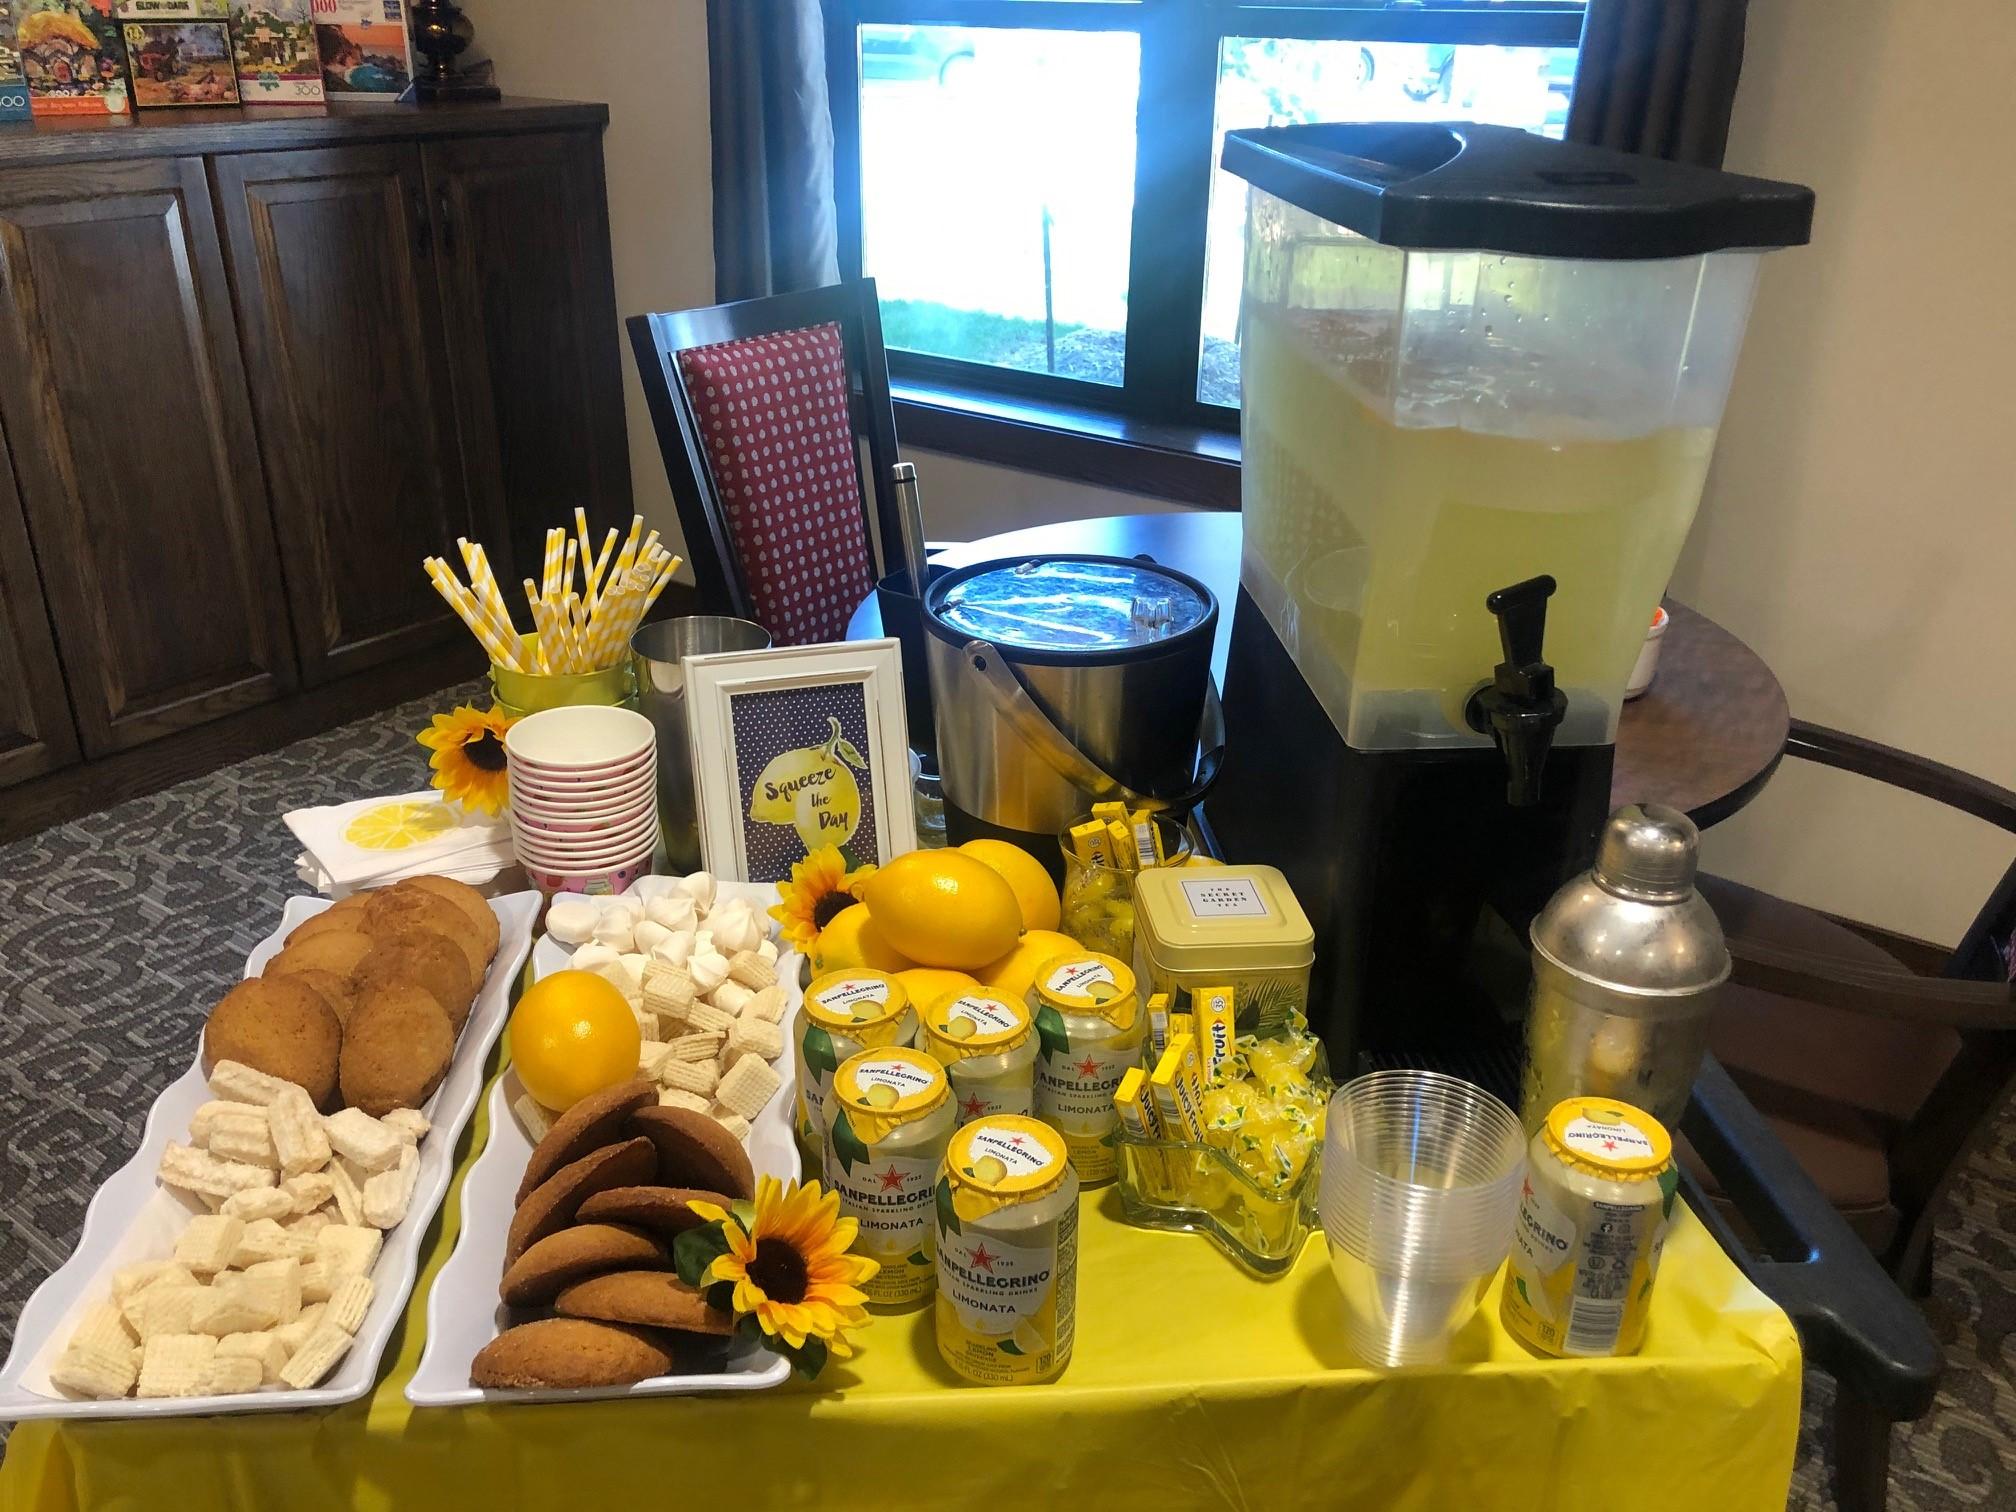 Nationa Lemon Day cart